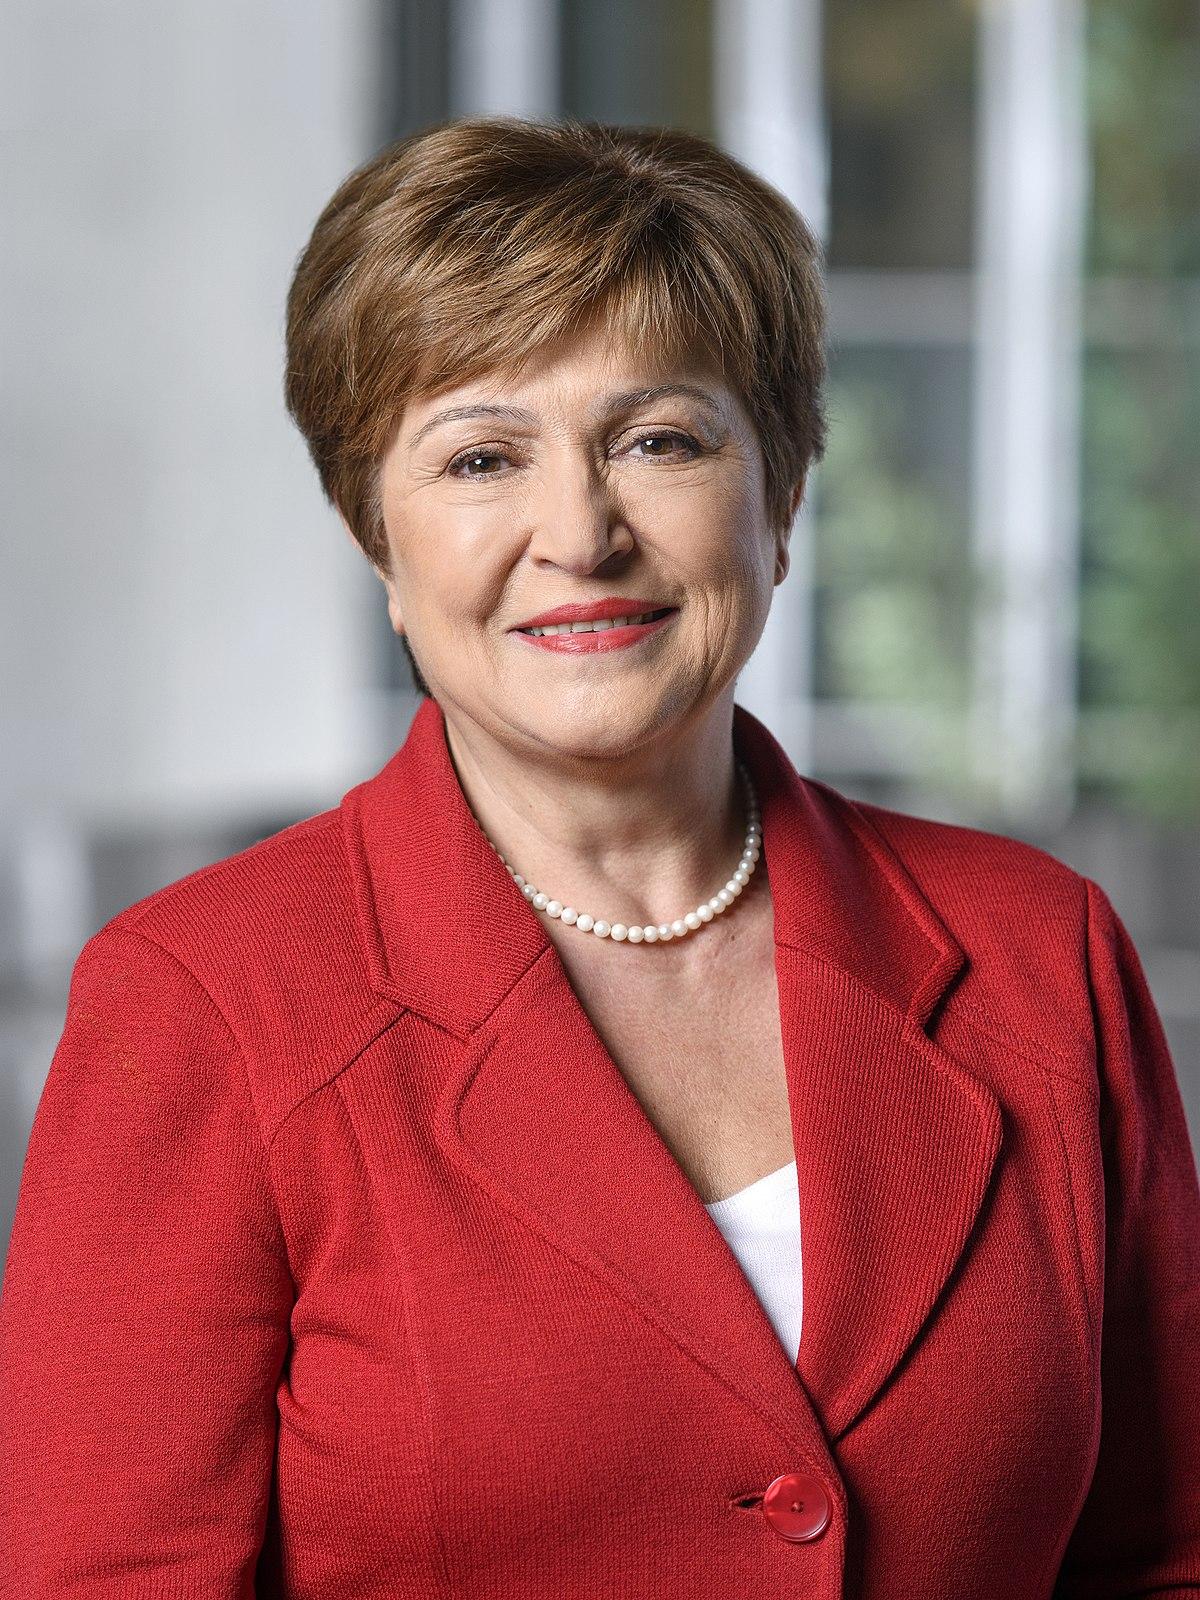 Kristalina Georgieva - Wikipedia